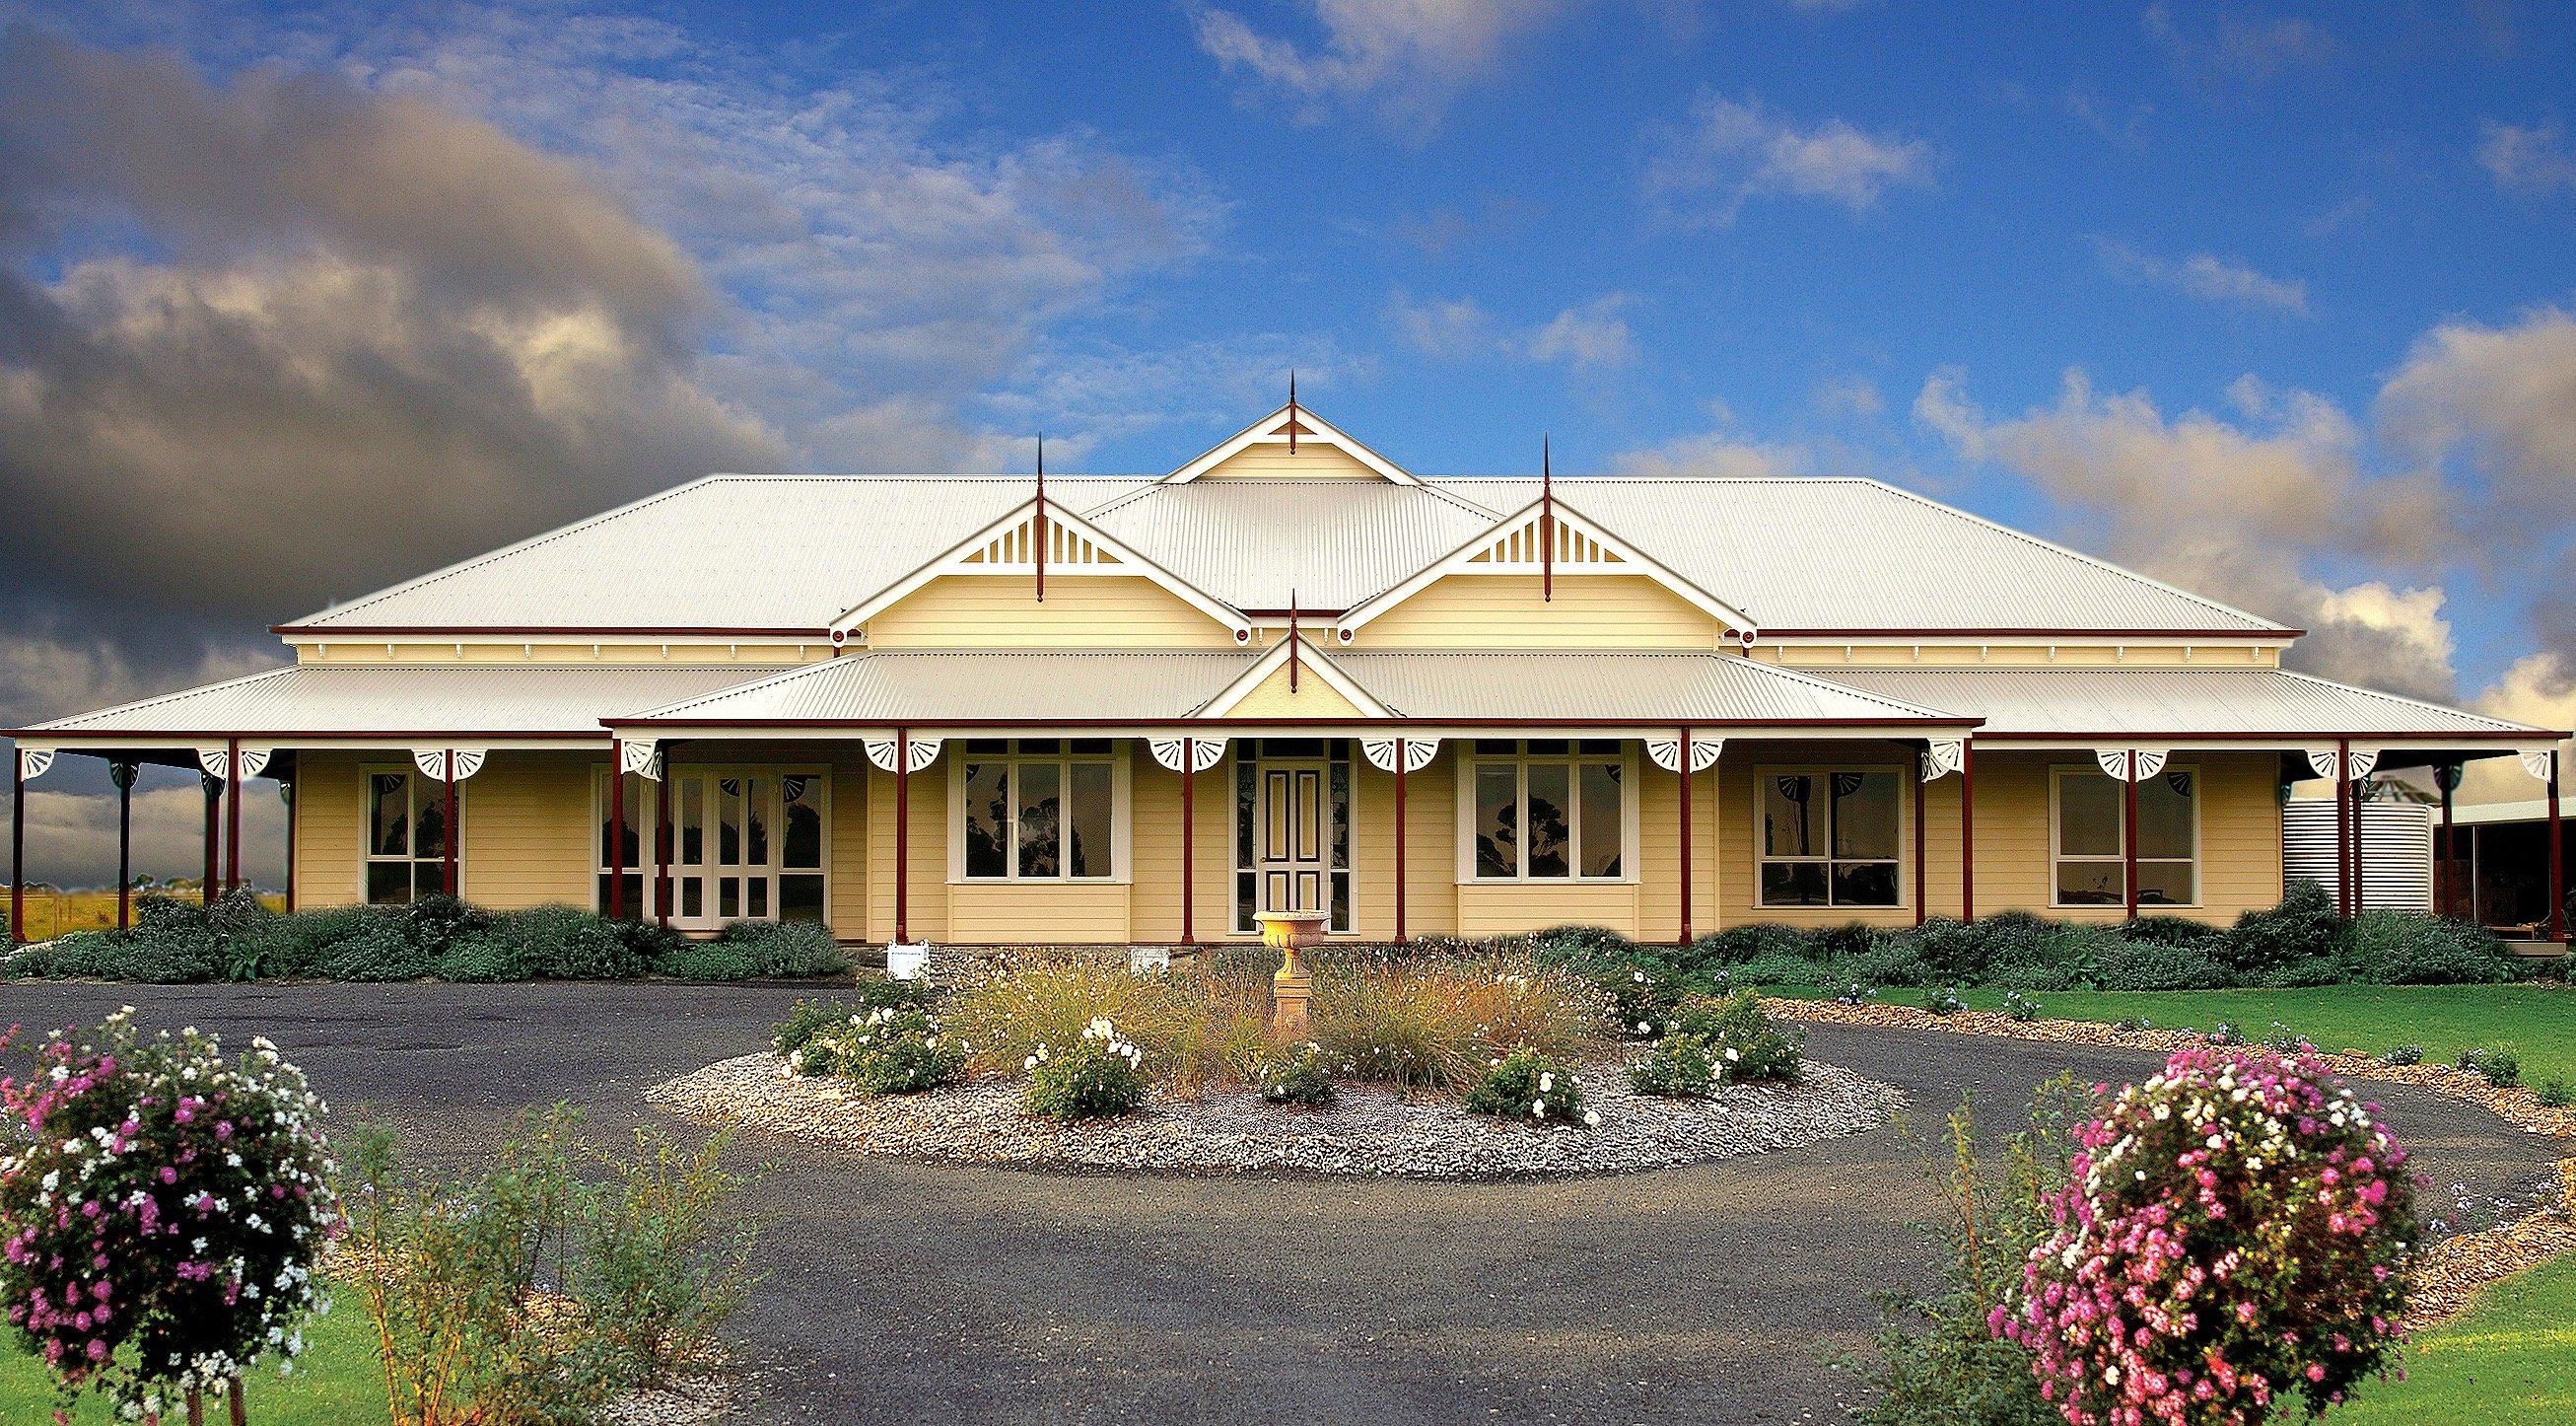 Country Homestead House Plans Australia